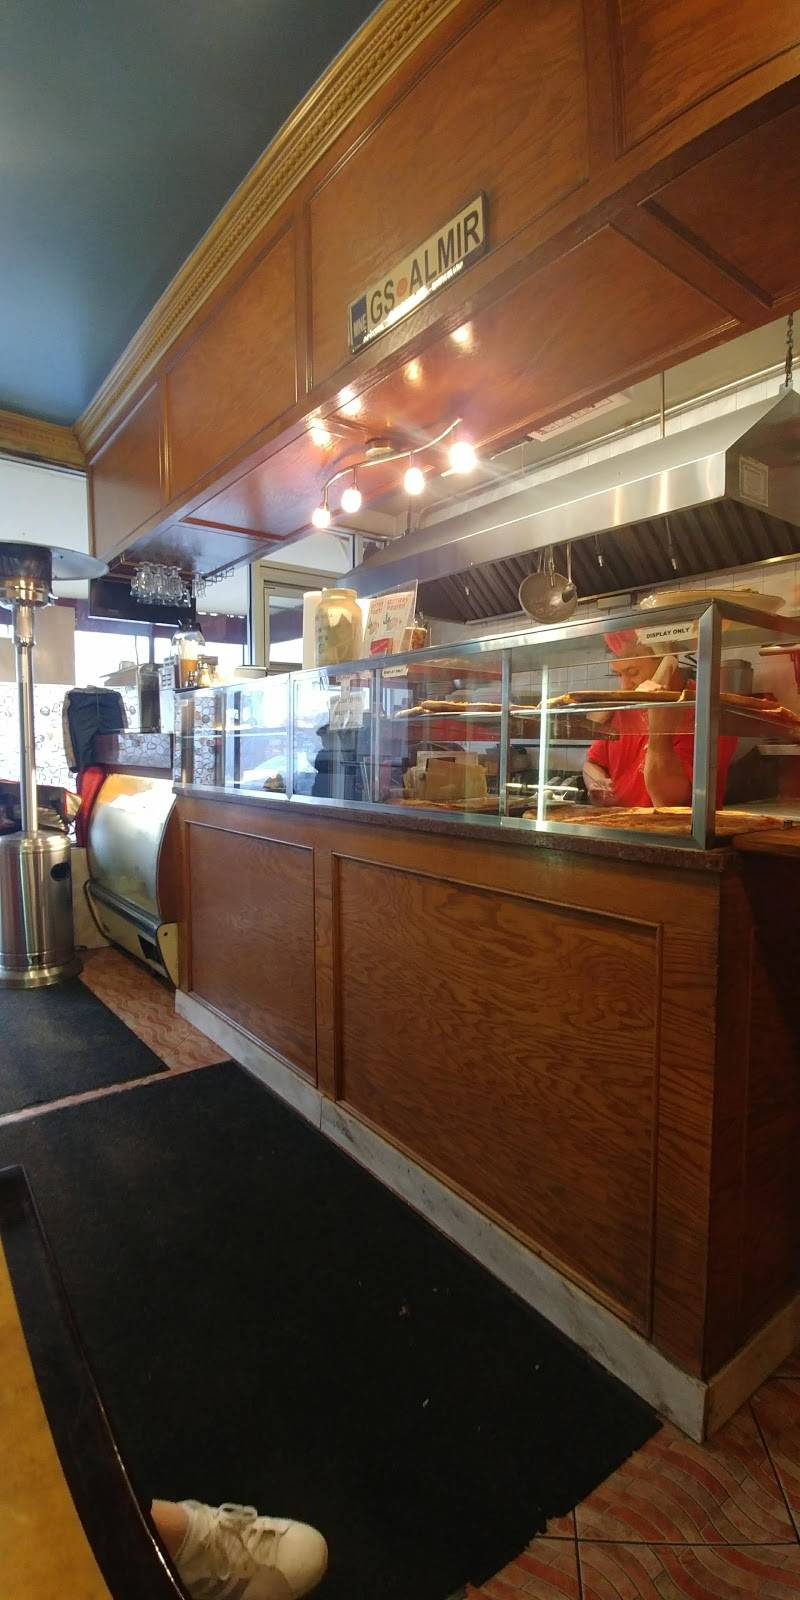 Brothers Pizzeria | restaurant | 3050 14th St, Astoria, NY 11102, USA | 7187771111 OR +1 718-777-1111